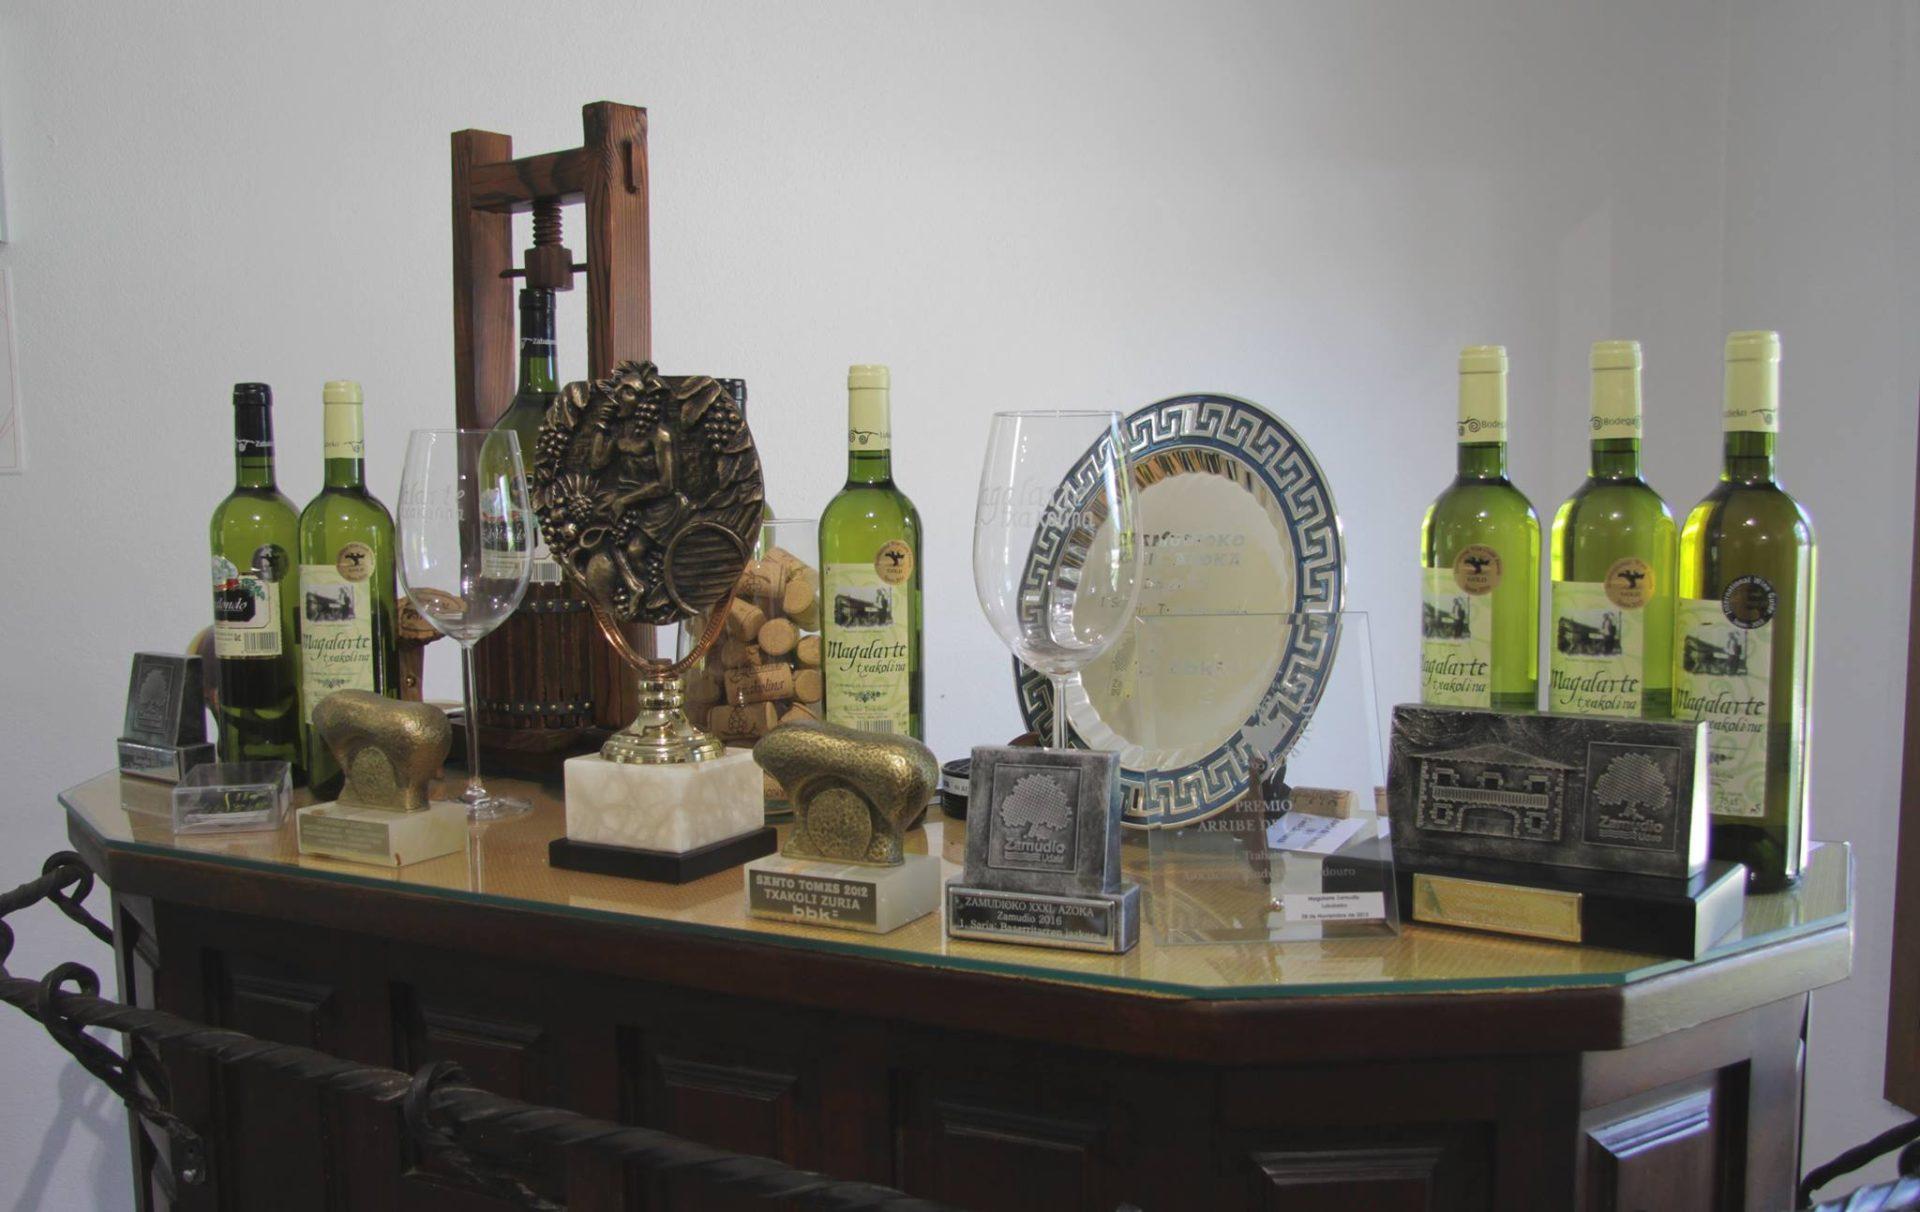 Txakoli Zabalondo Bodega Magalarte Zamudio premios y trofeos